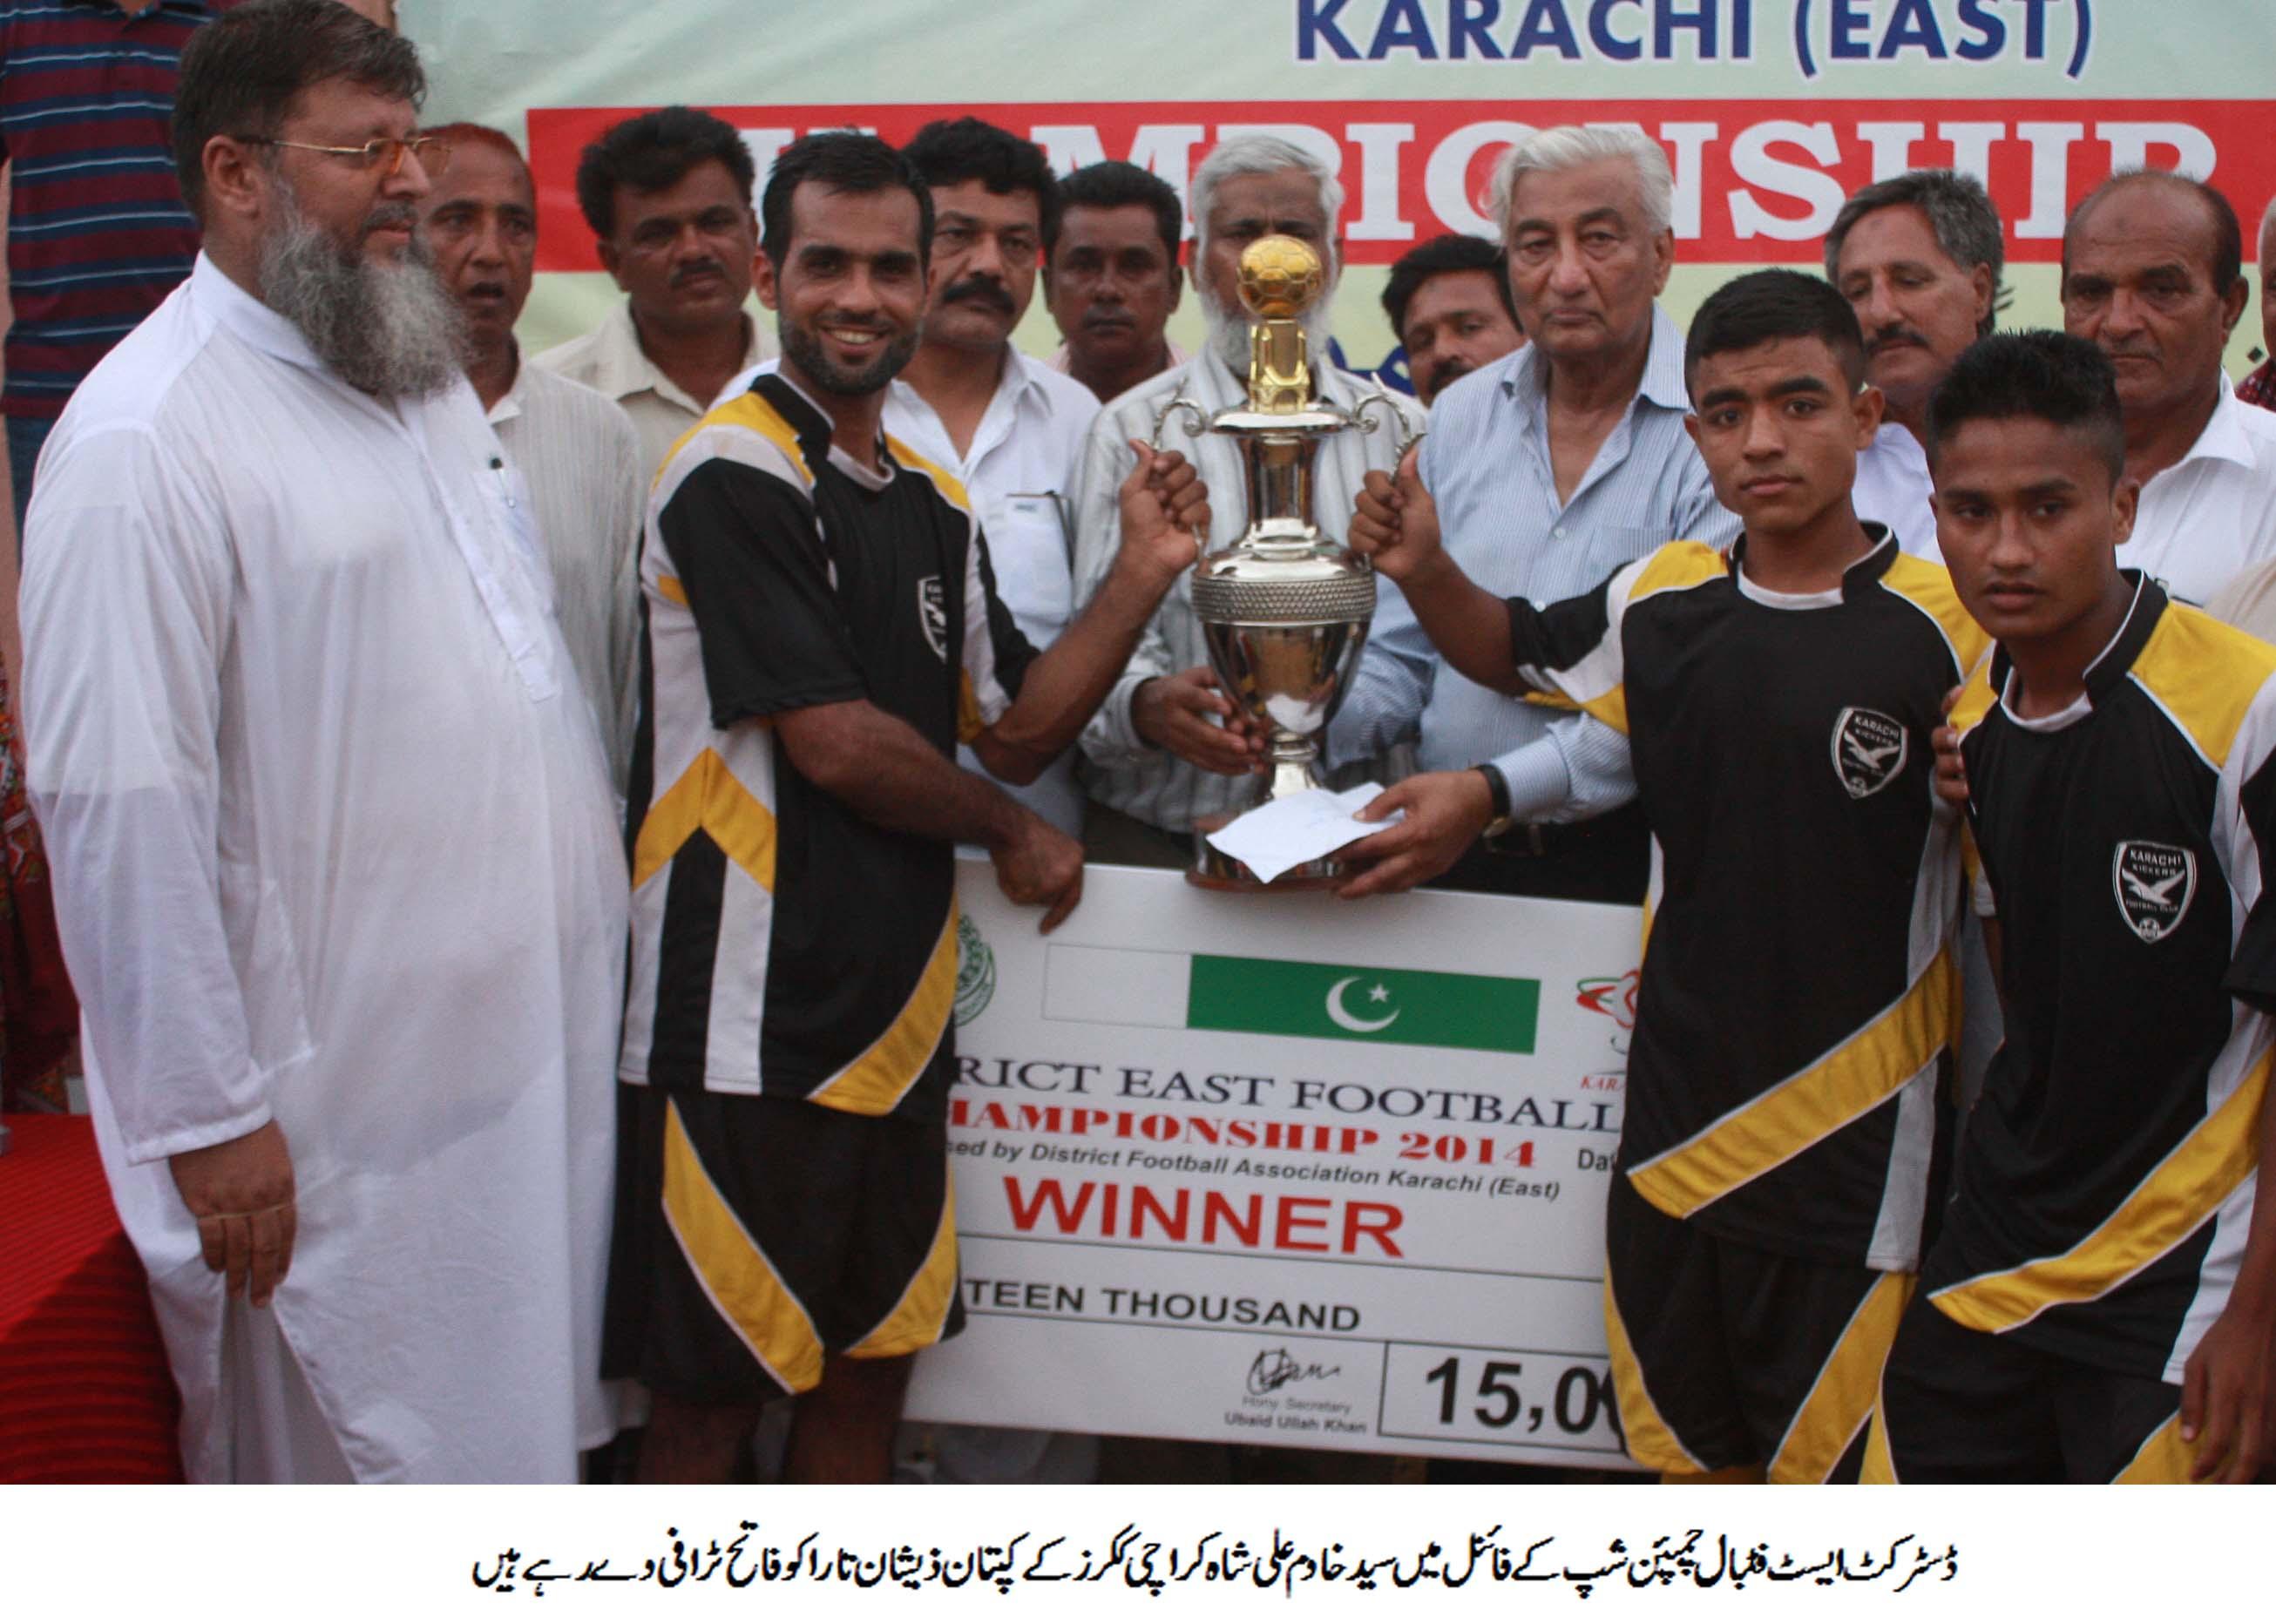 Karachi Kickers retain District East Championship title!